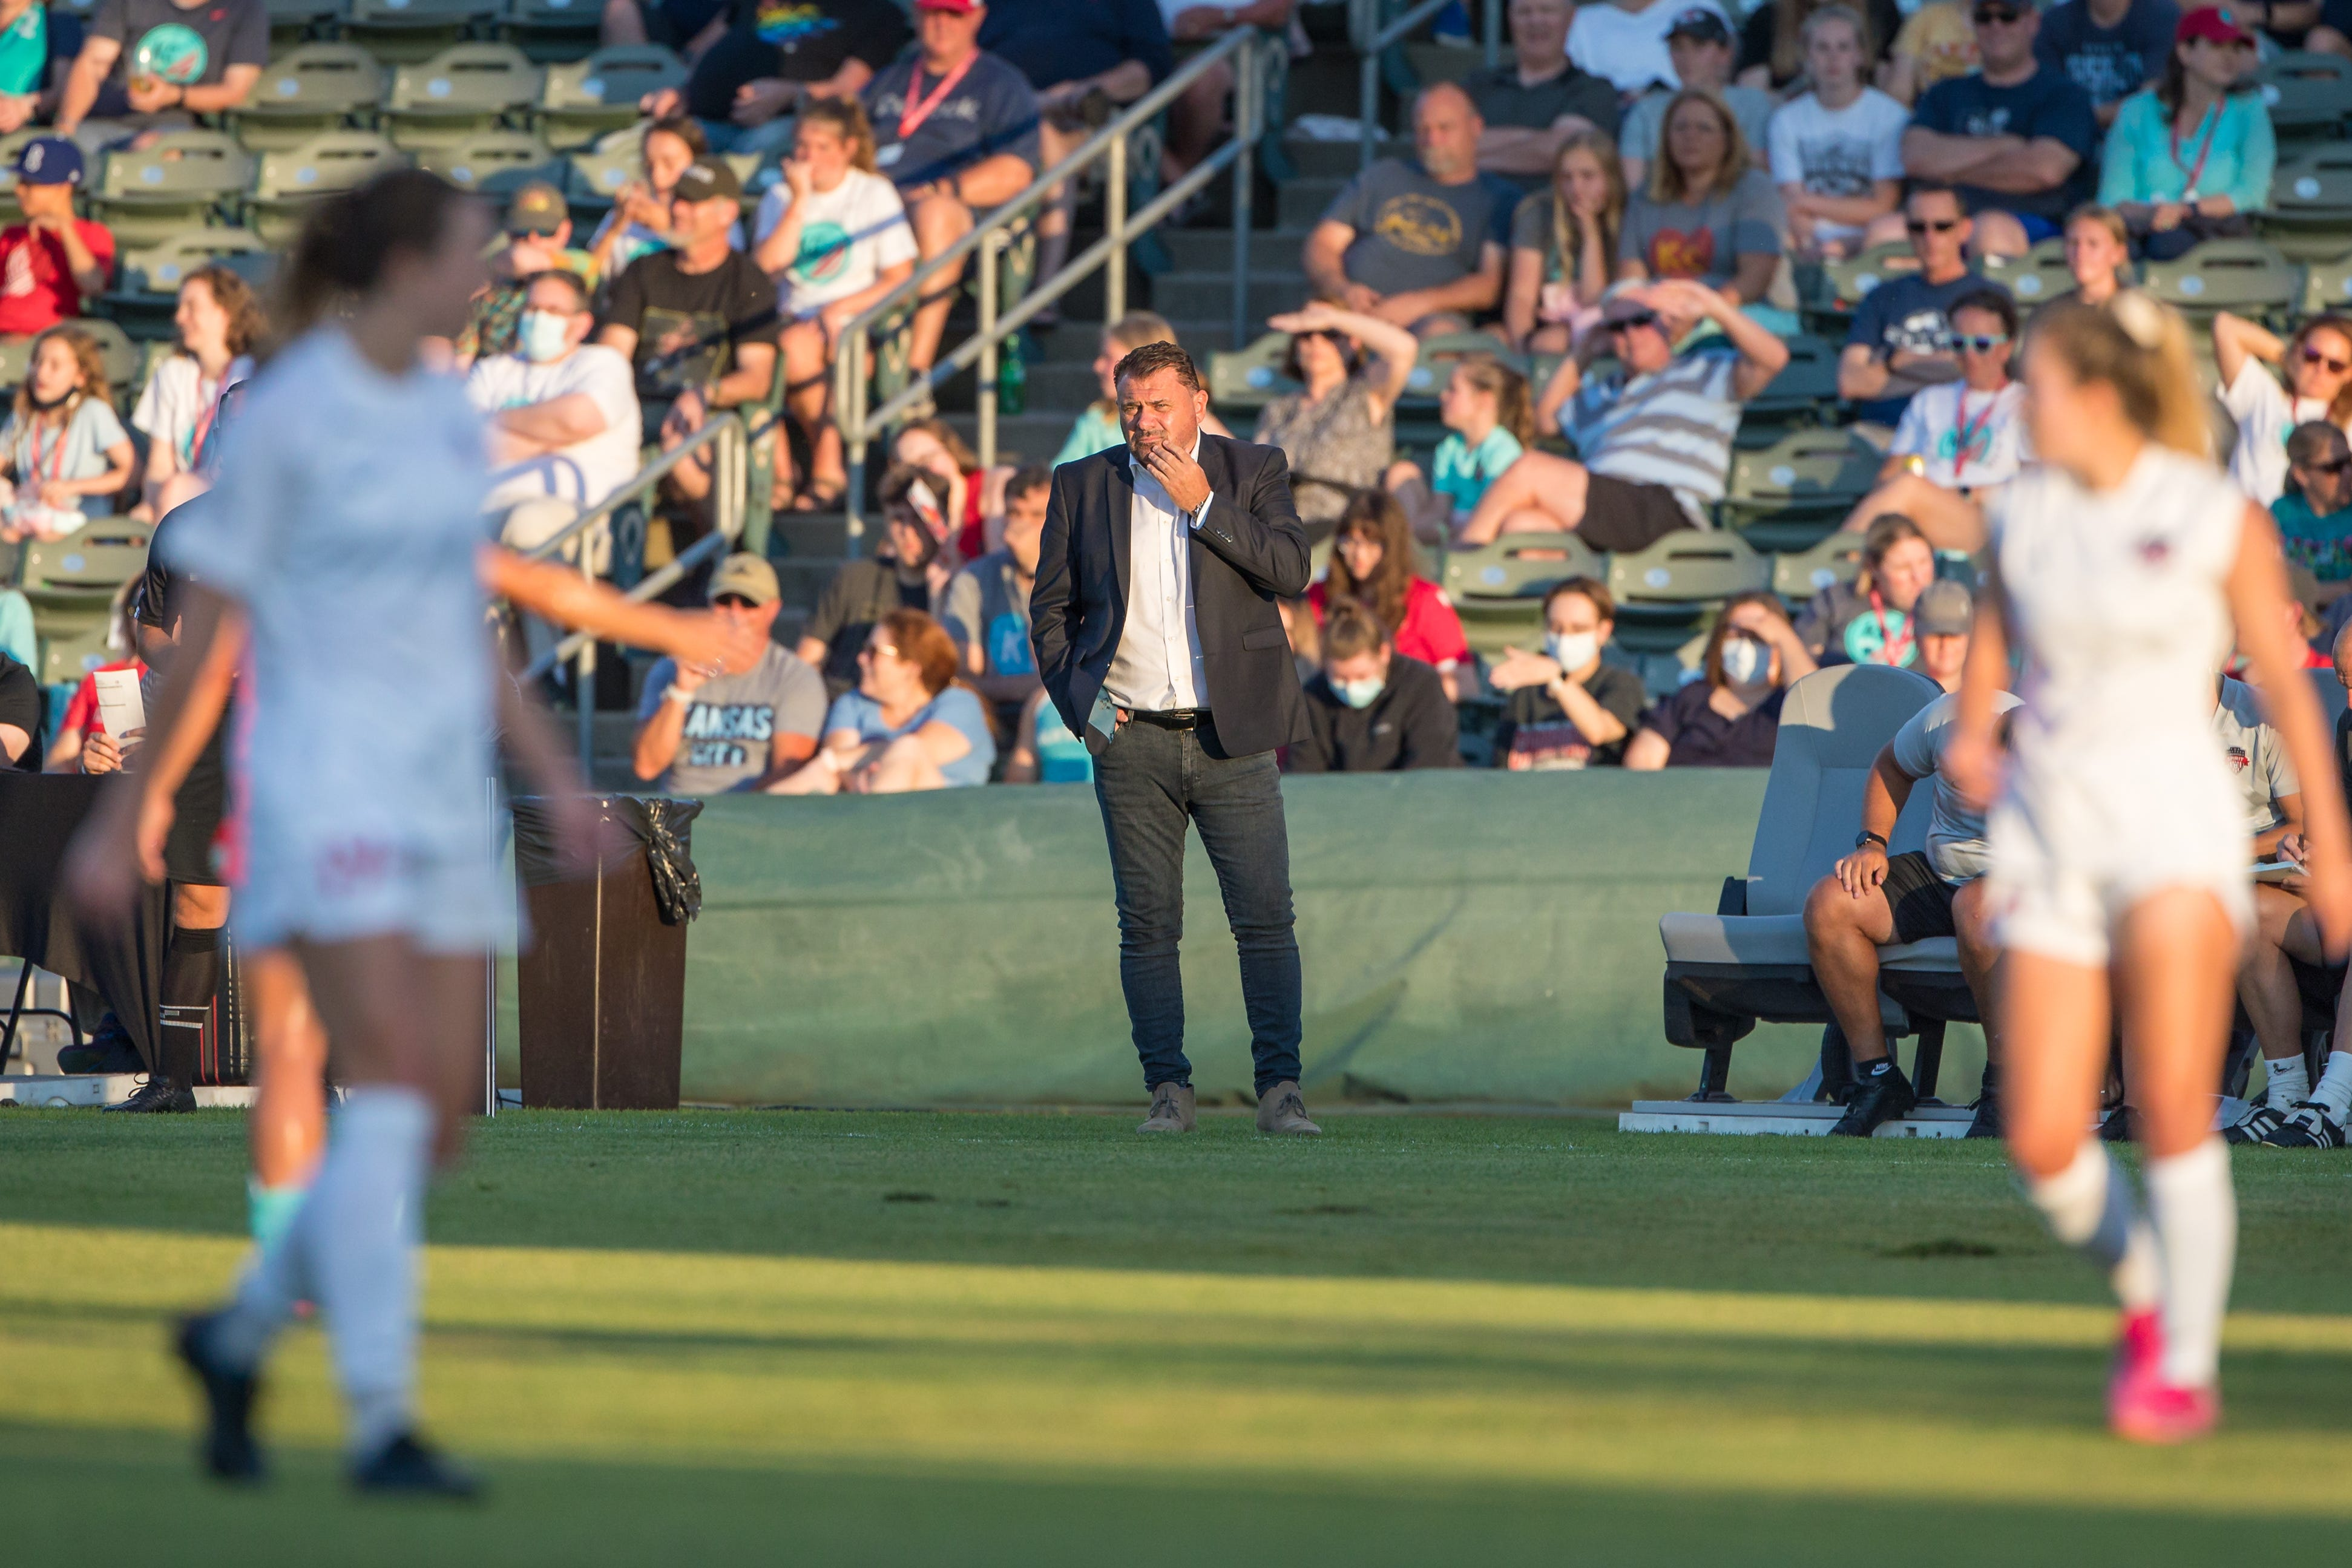 Report: Former Washington Spirit coach Richie Burke emotionally abused NWSL players